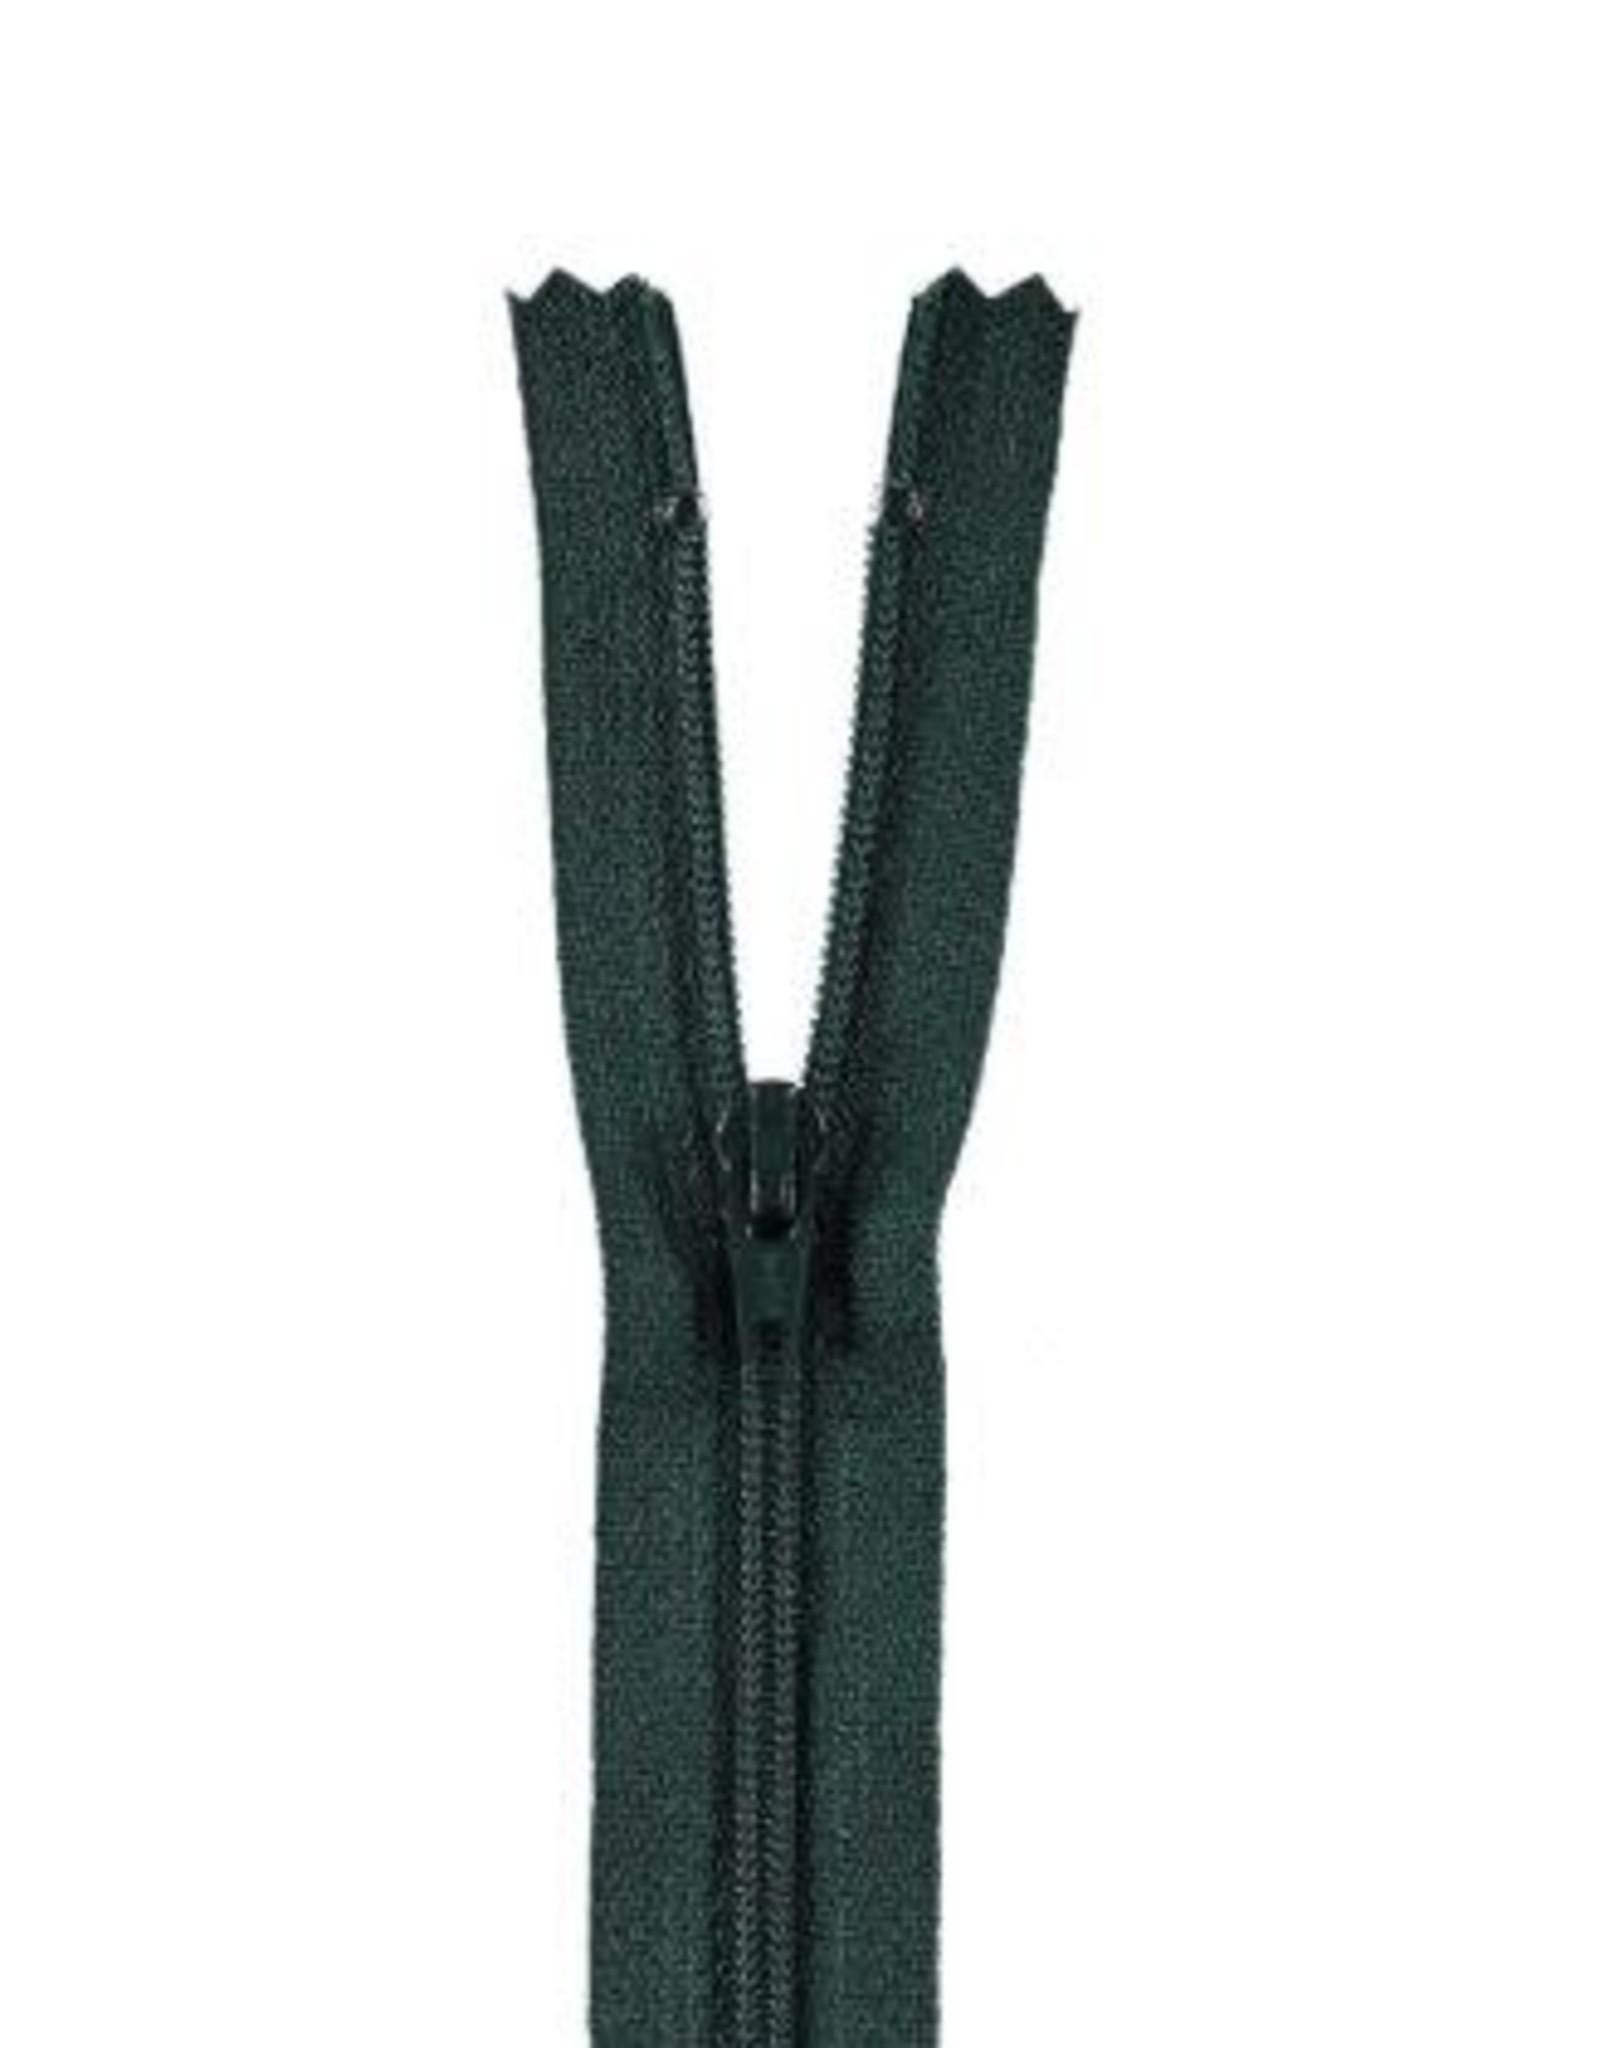 YKK Spiraalrits niet-DB 3mm donker groen 890-15cm